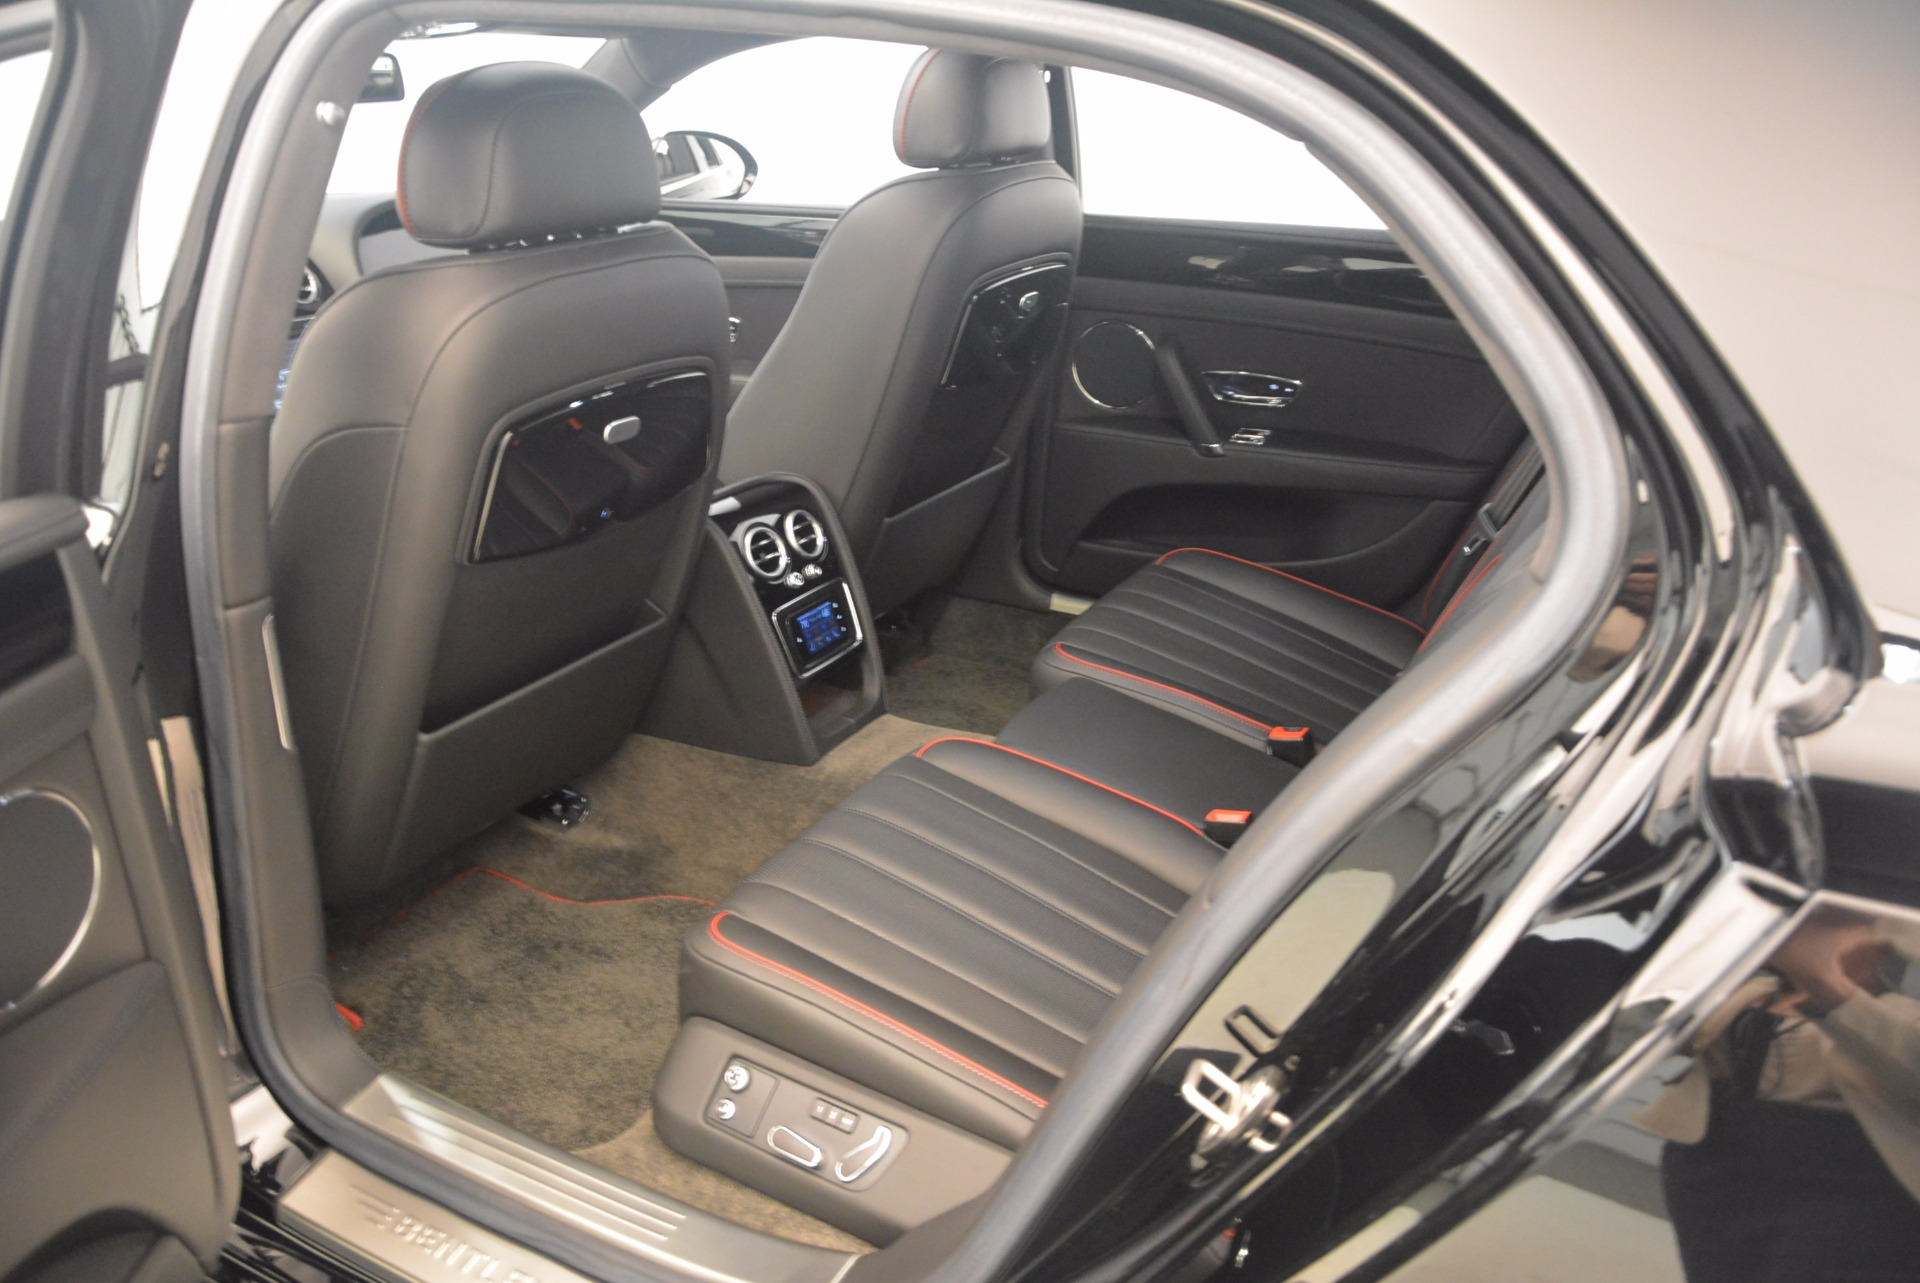 Used 2015 Bentley Flying Spur V8 For Sale In Westport, CT 1199_p33